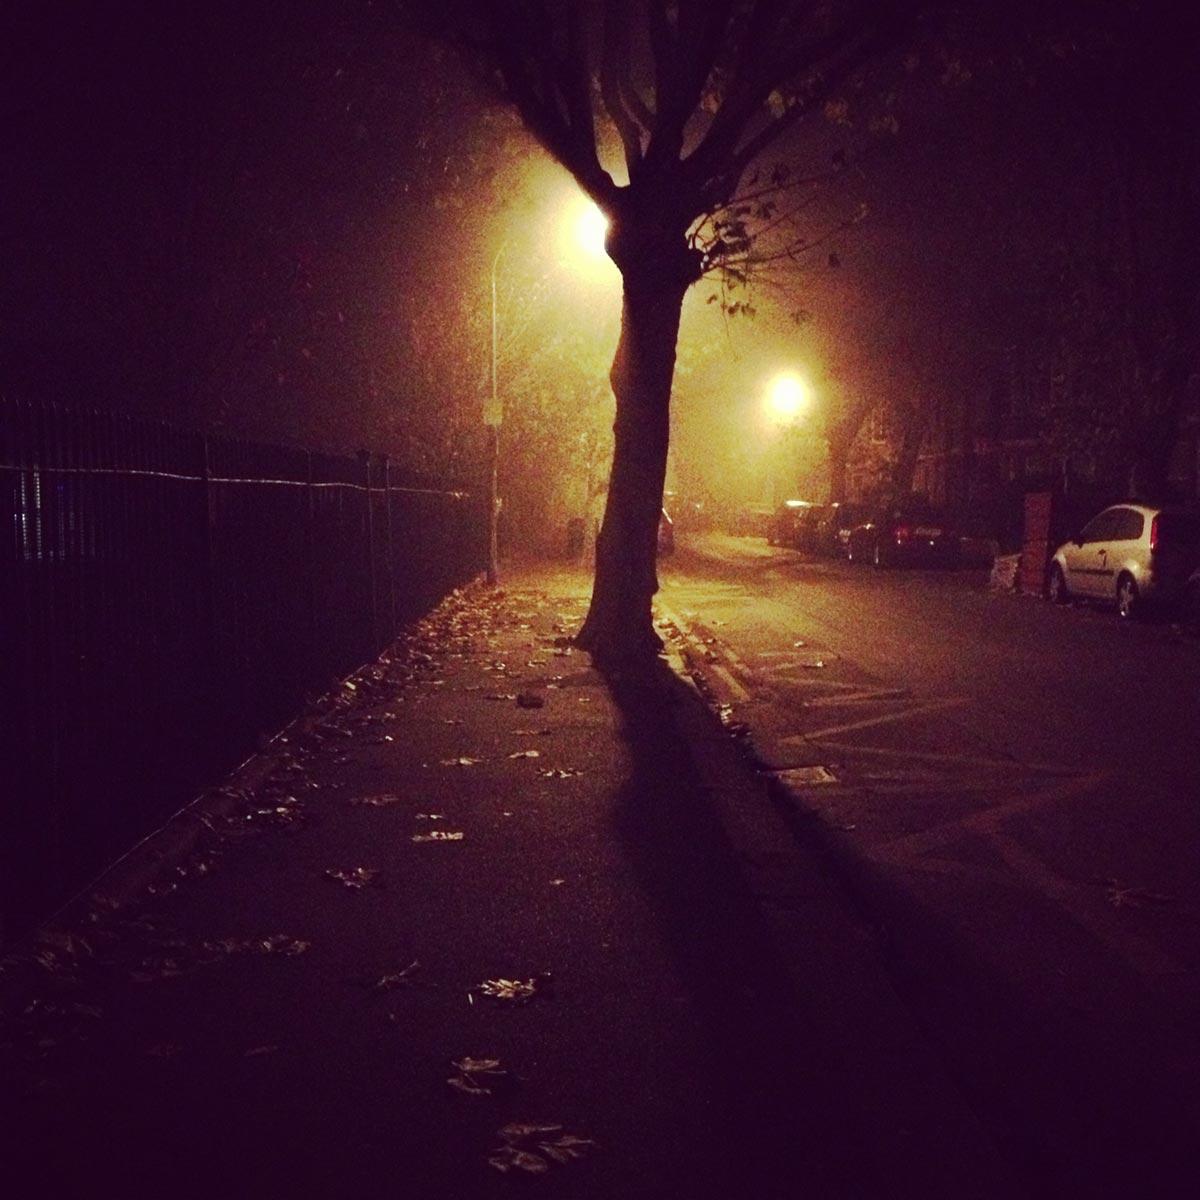 Walthamstow by night